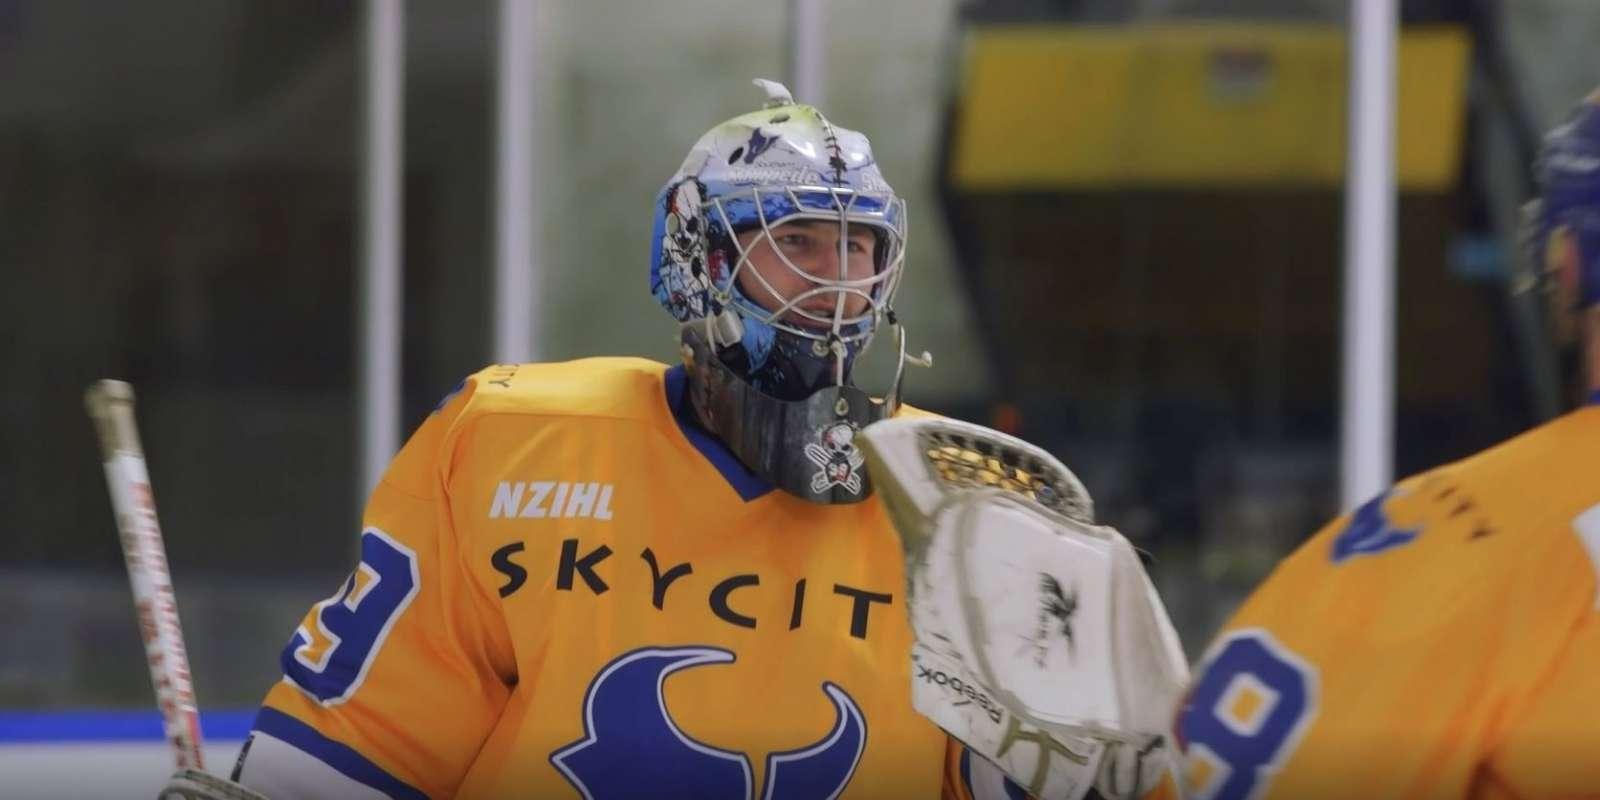 Skycity Stampede Ice Hockey team